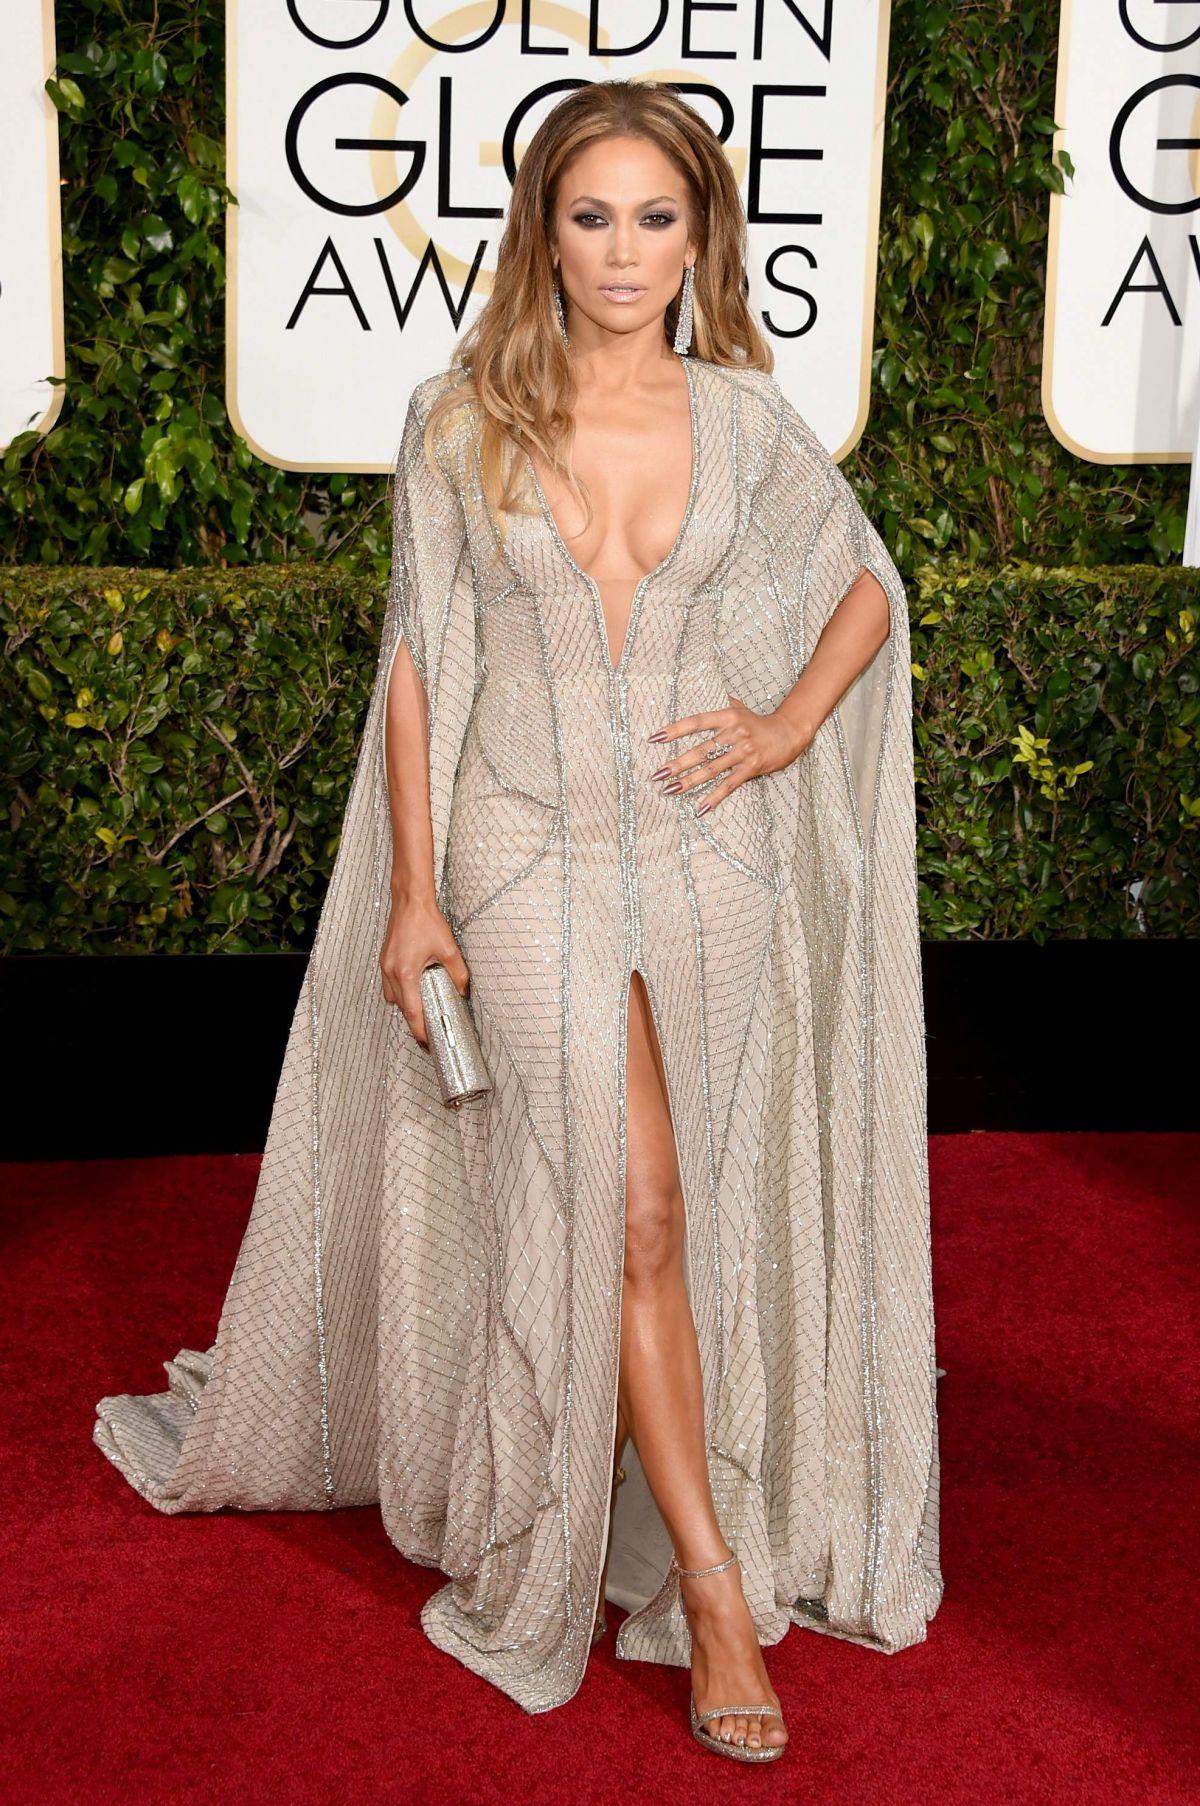 JENNIFER LOPEZ at 2015 Golden Globes Awards